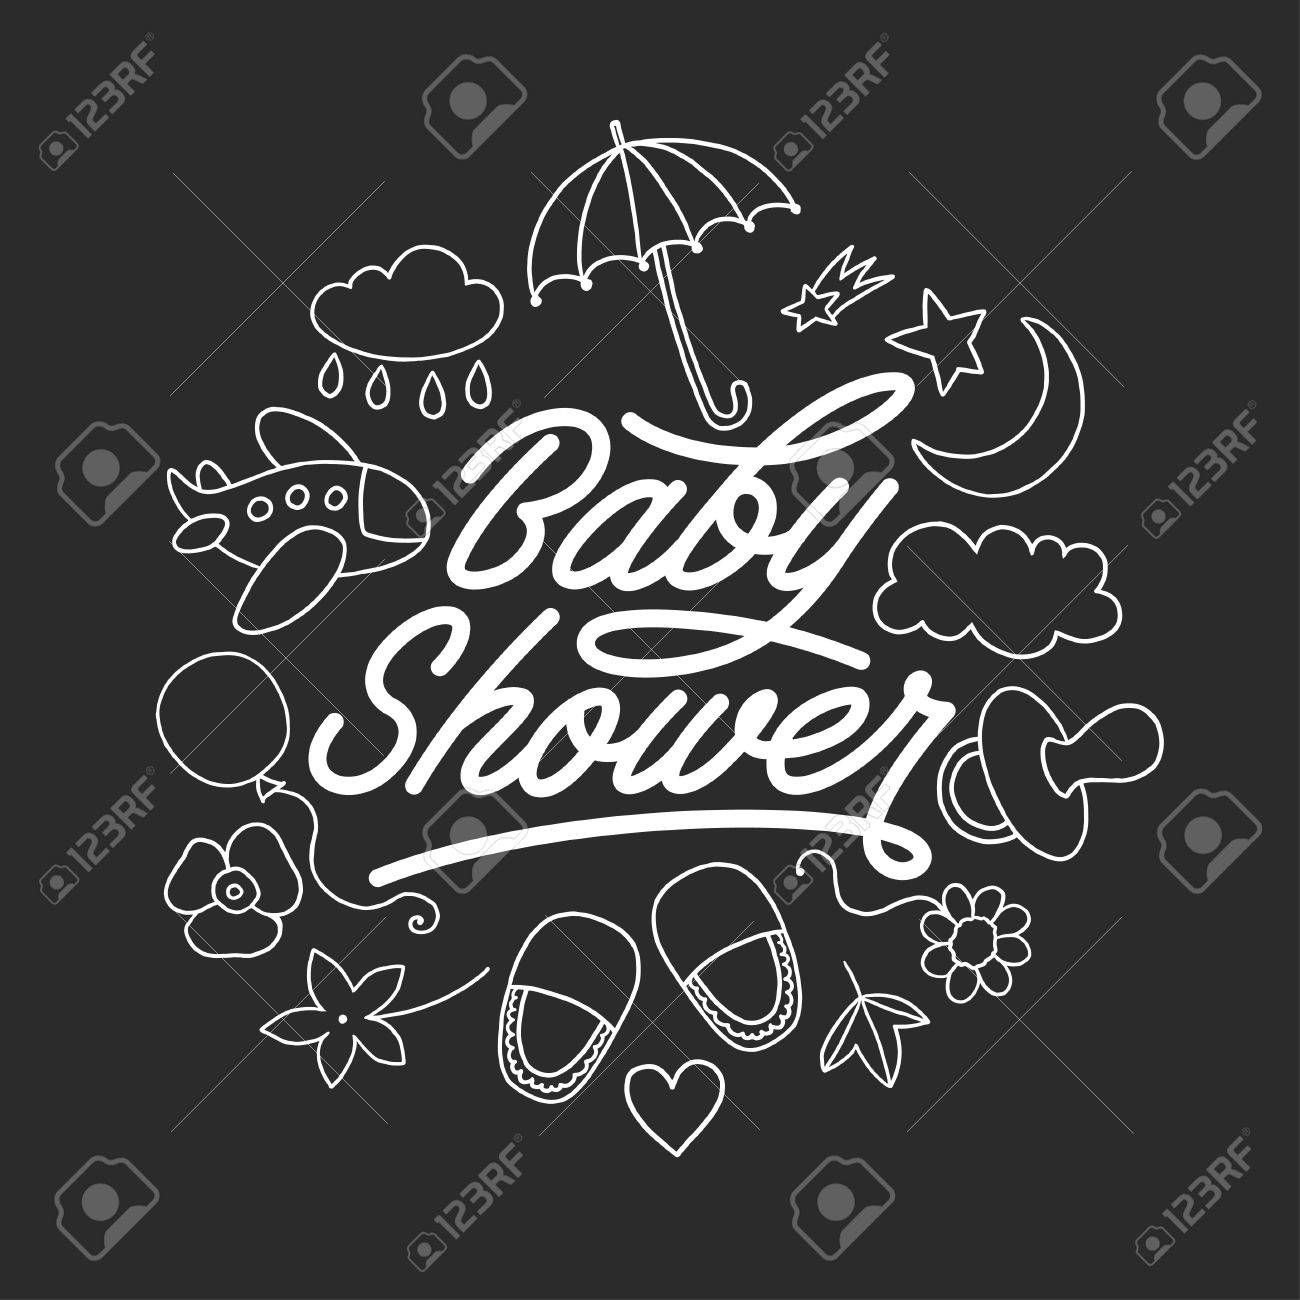 Baby Shower Invitation Chalkboard Template. Doodle Design Elements ...